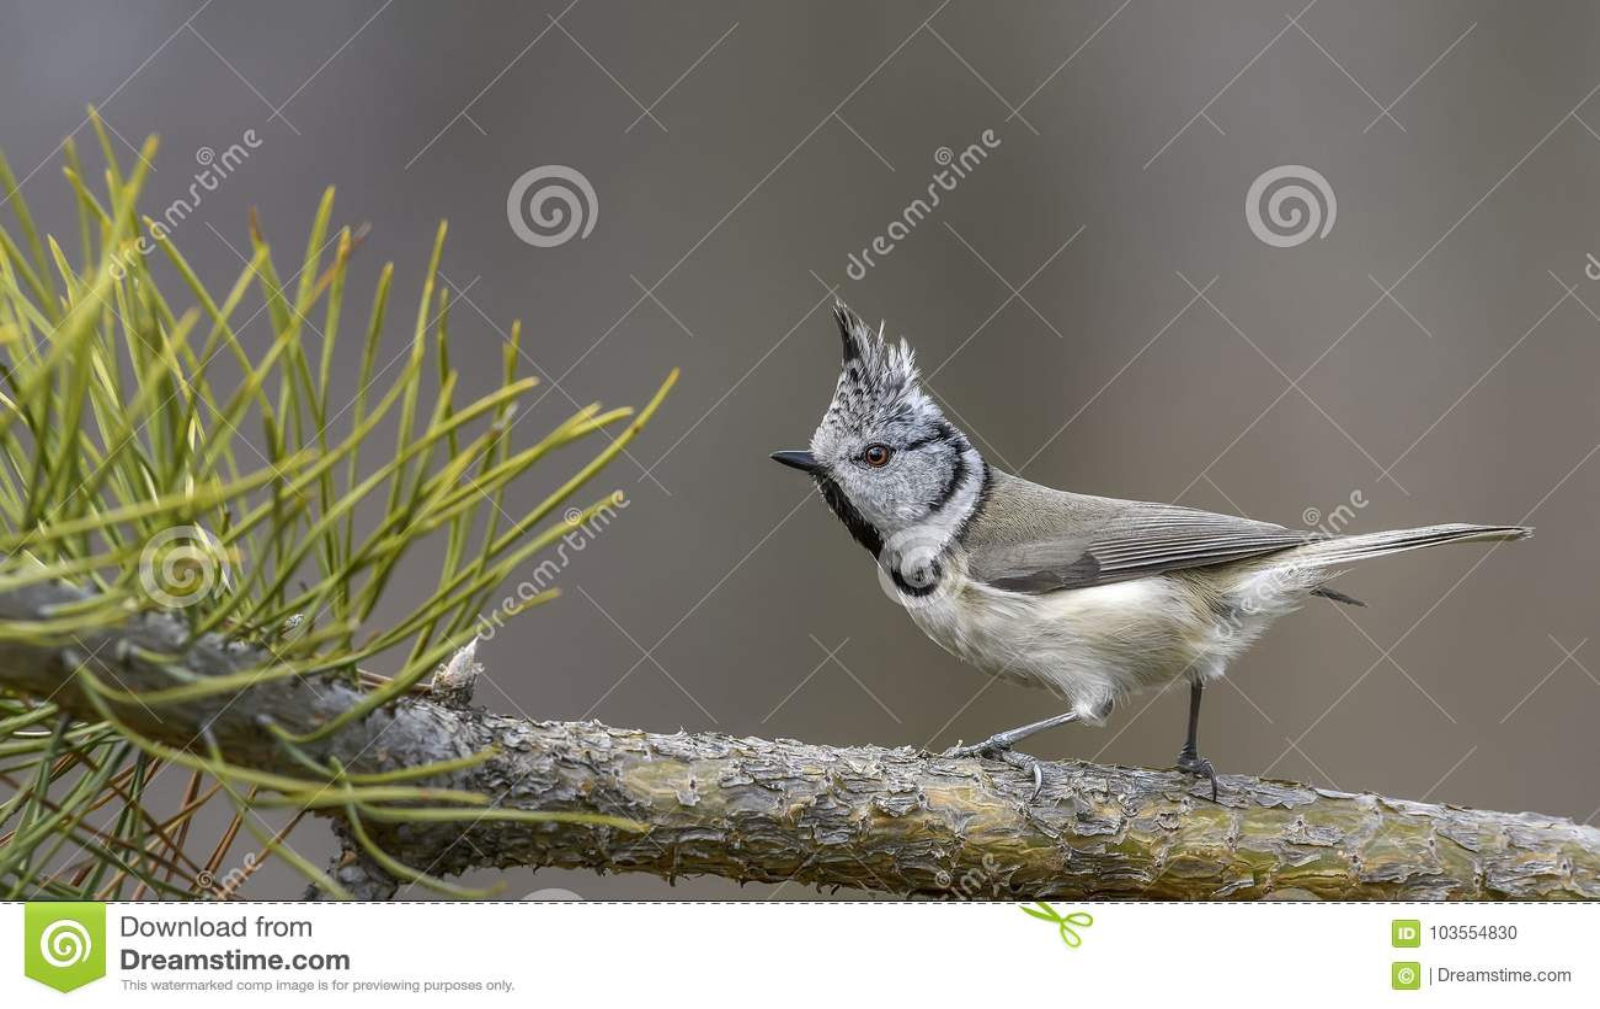 Ð ¡ στηρίχτηκε tit, πουλί, πουλί με το λόφο, πουλί στη φύση